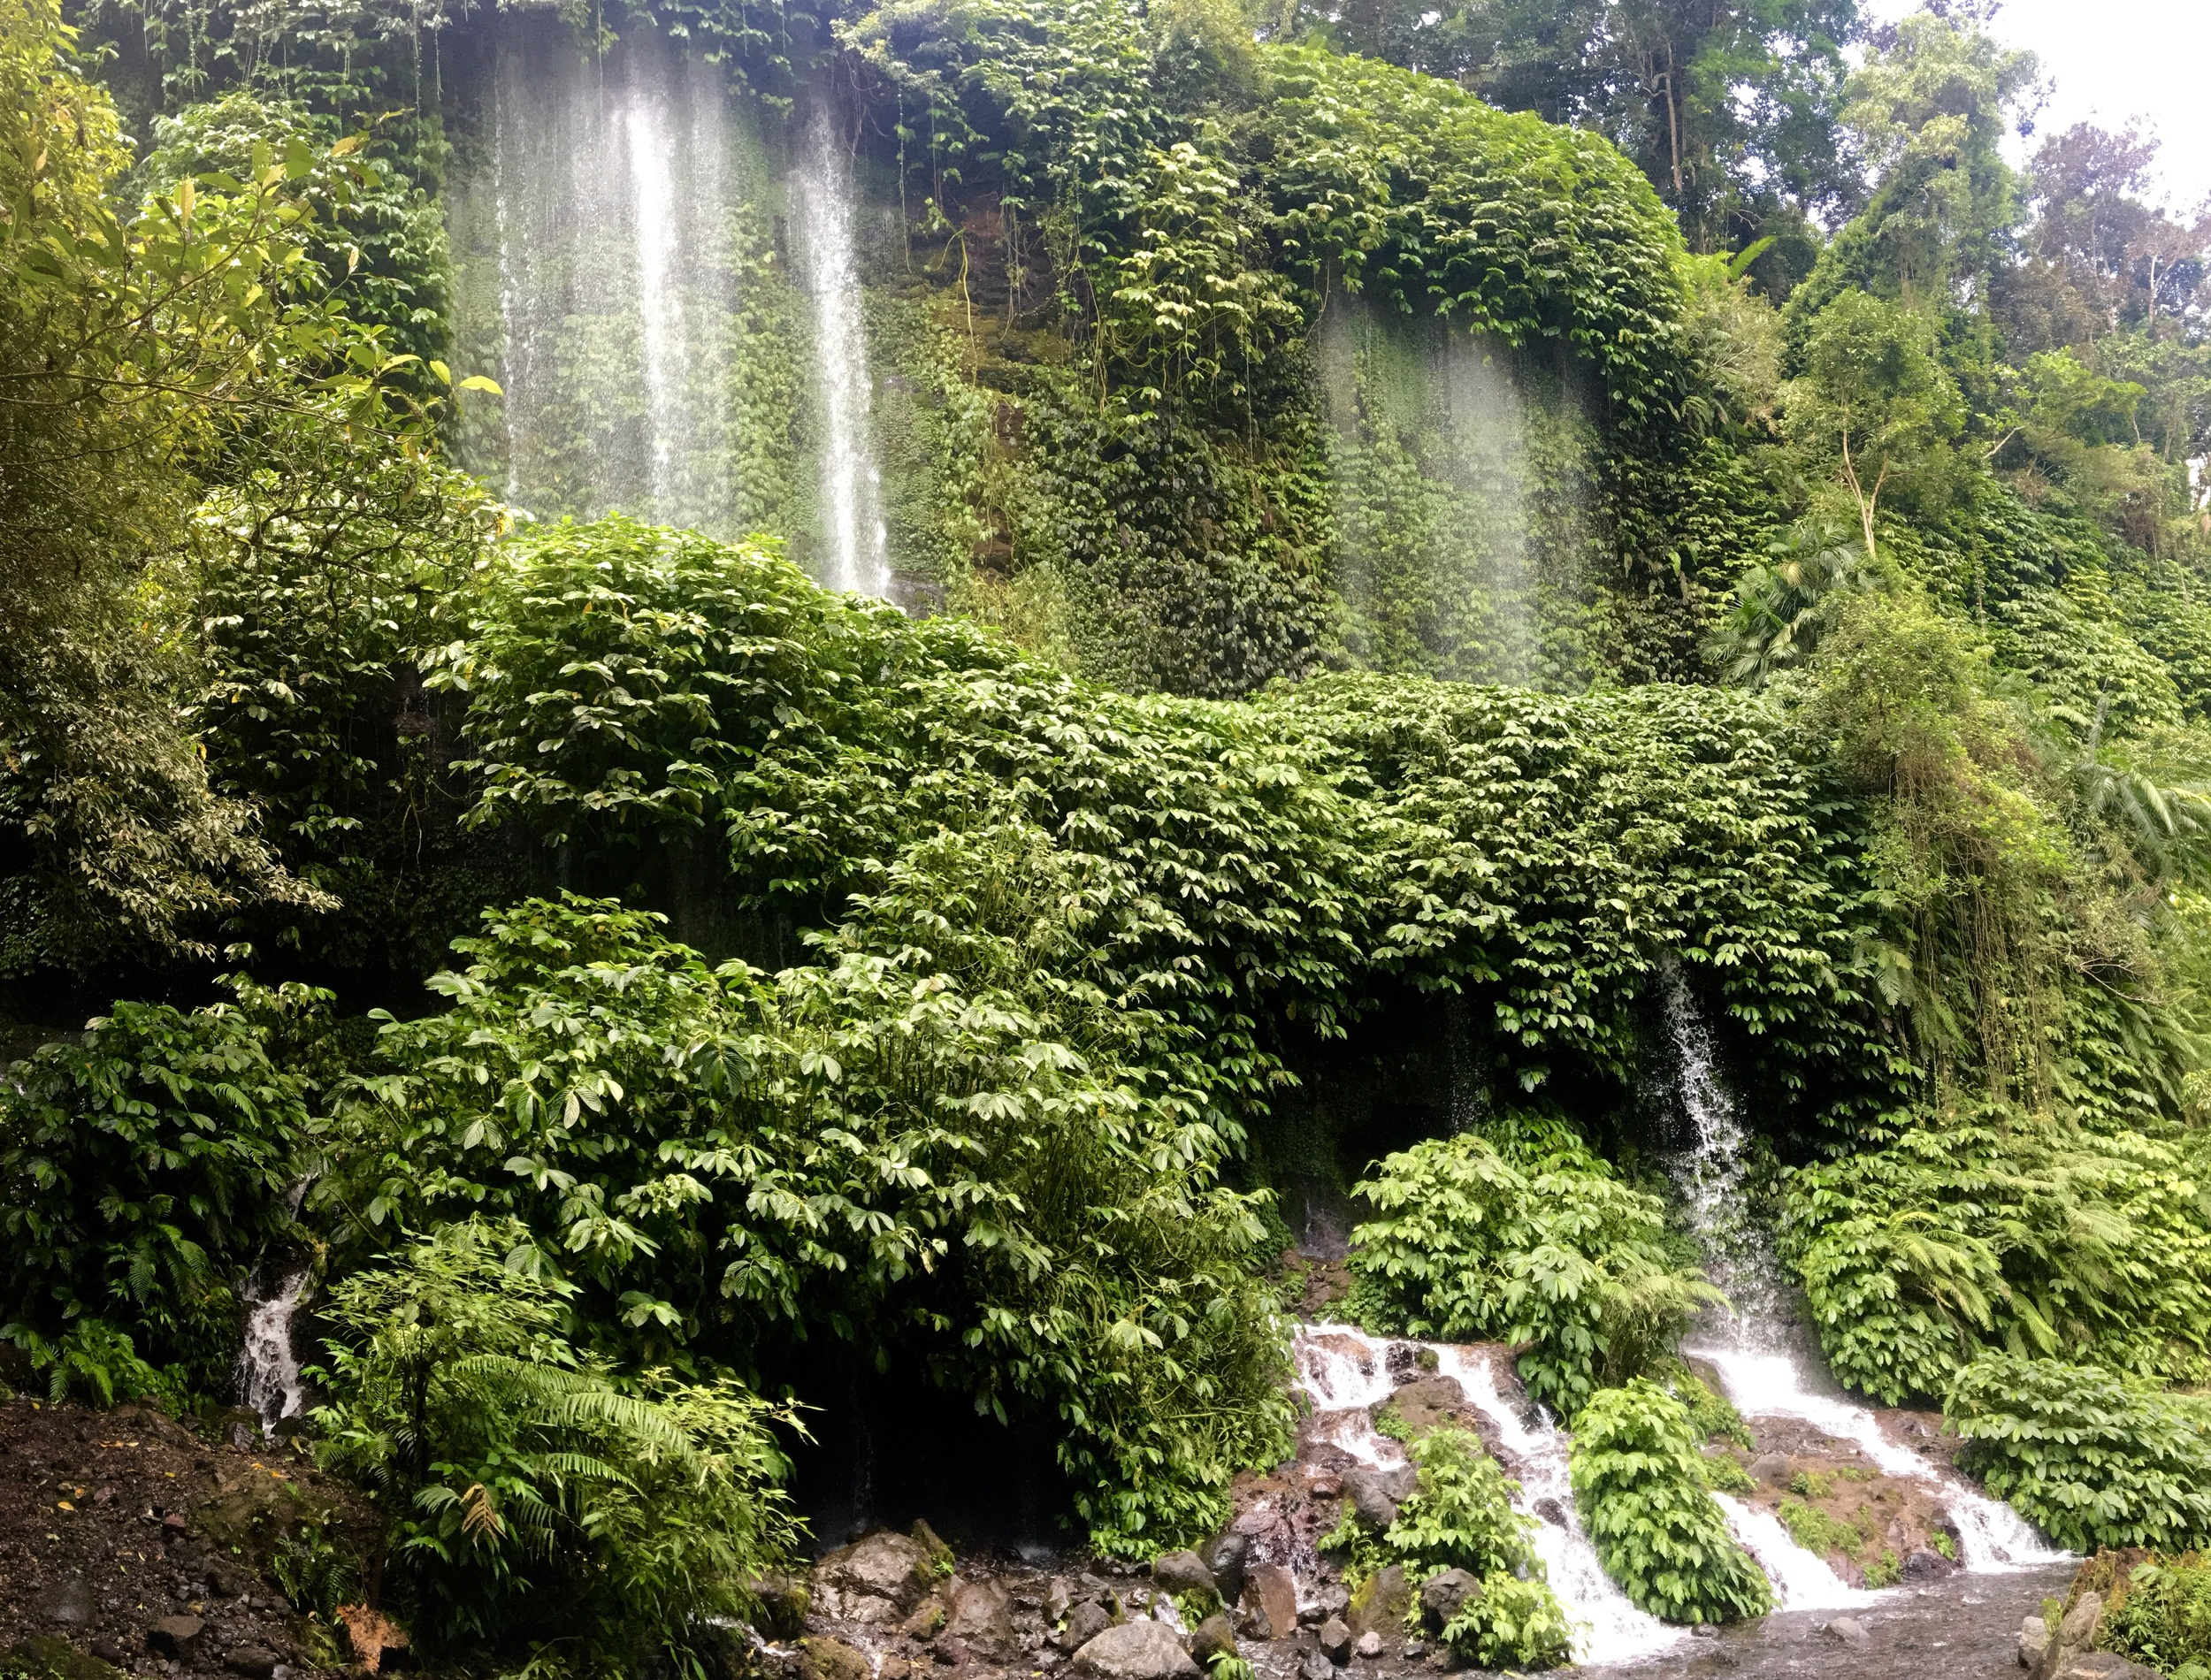 Curtain waterfalls